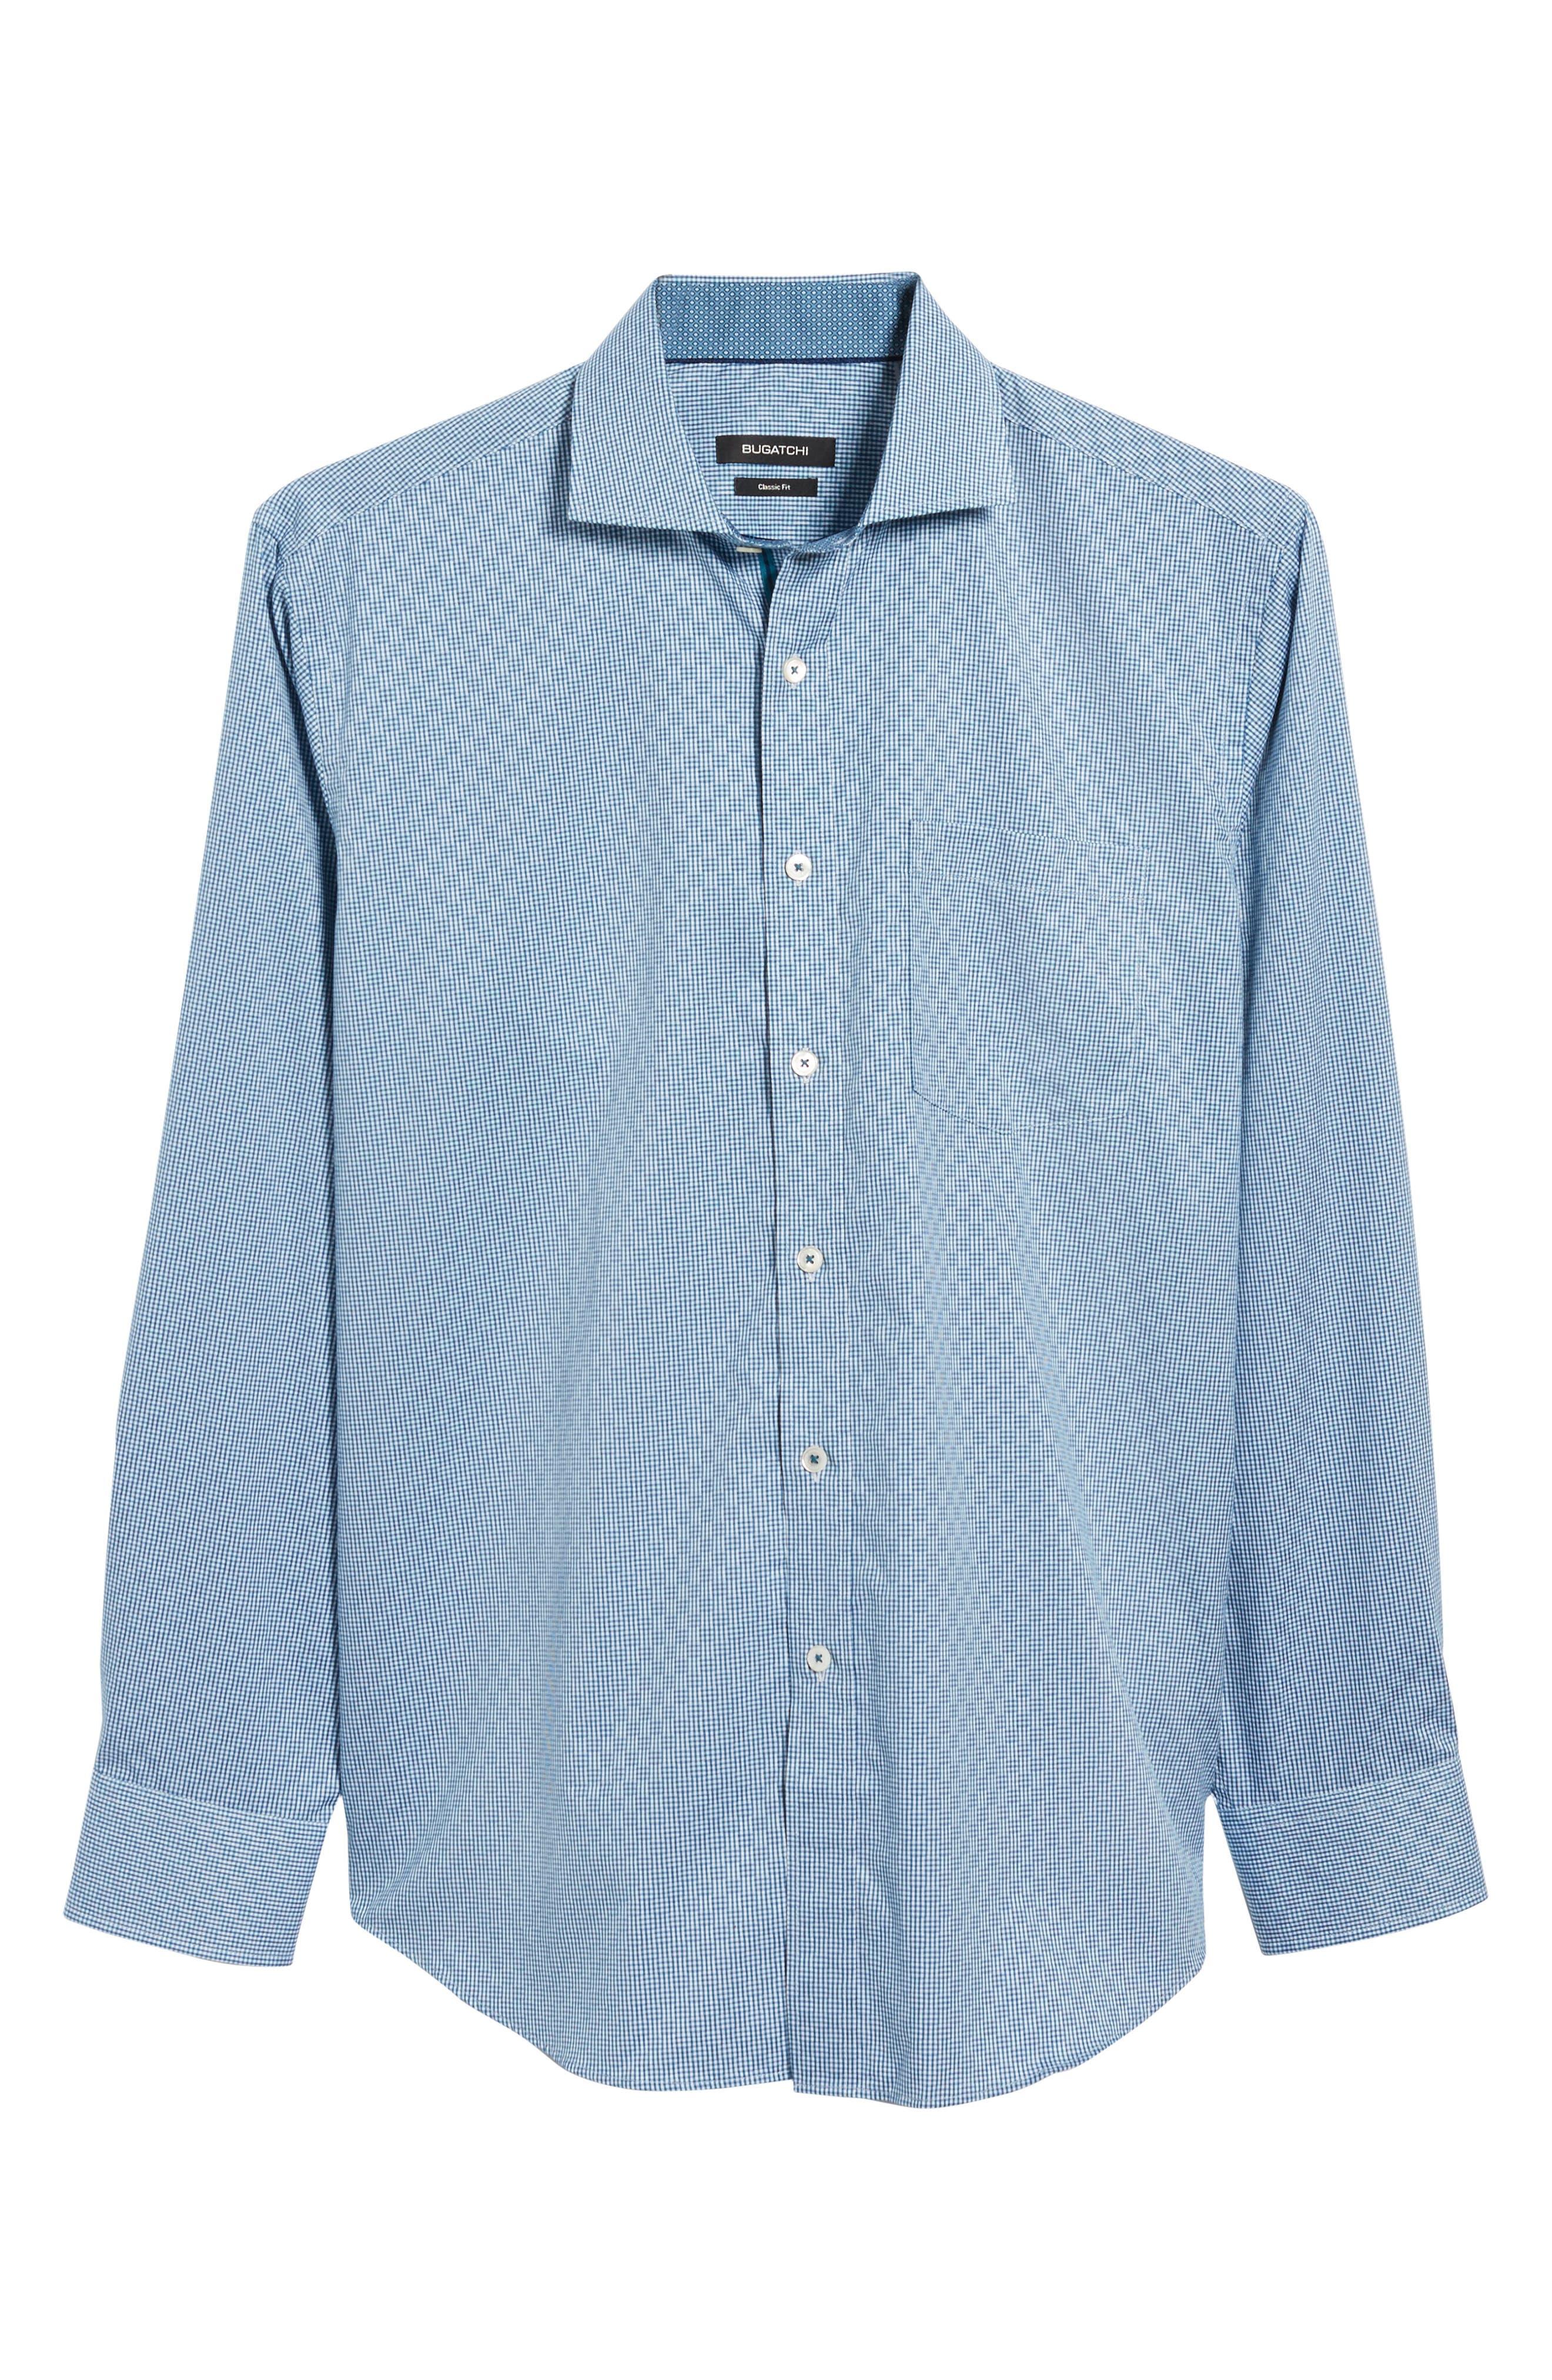 Classic Fit Check Sport Shirt,                             Alternate thumbnail 6, color,                             445